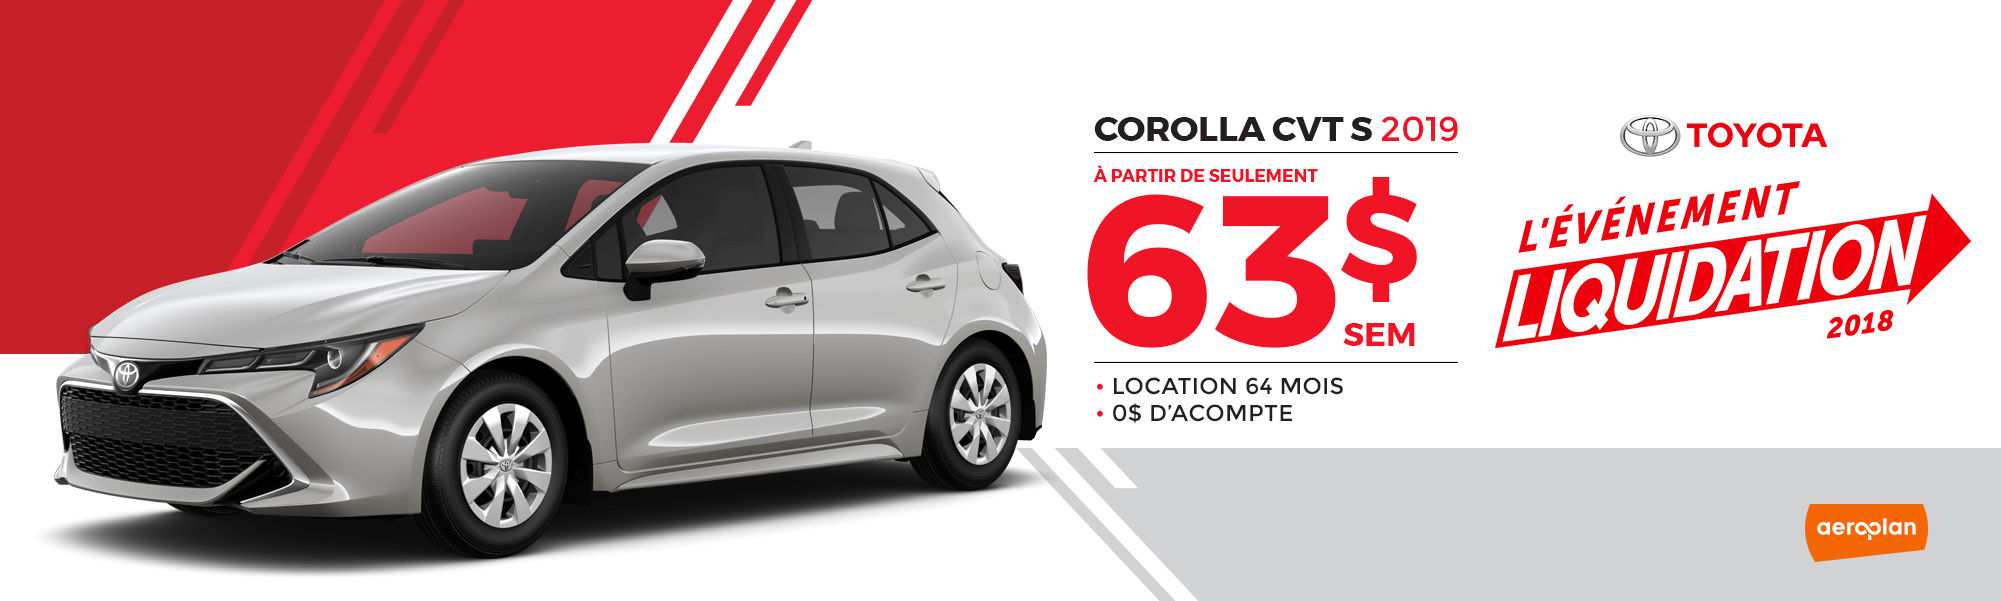 COROLLA CVT S 2019